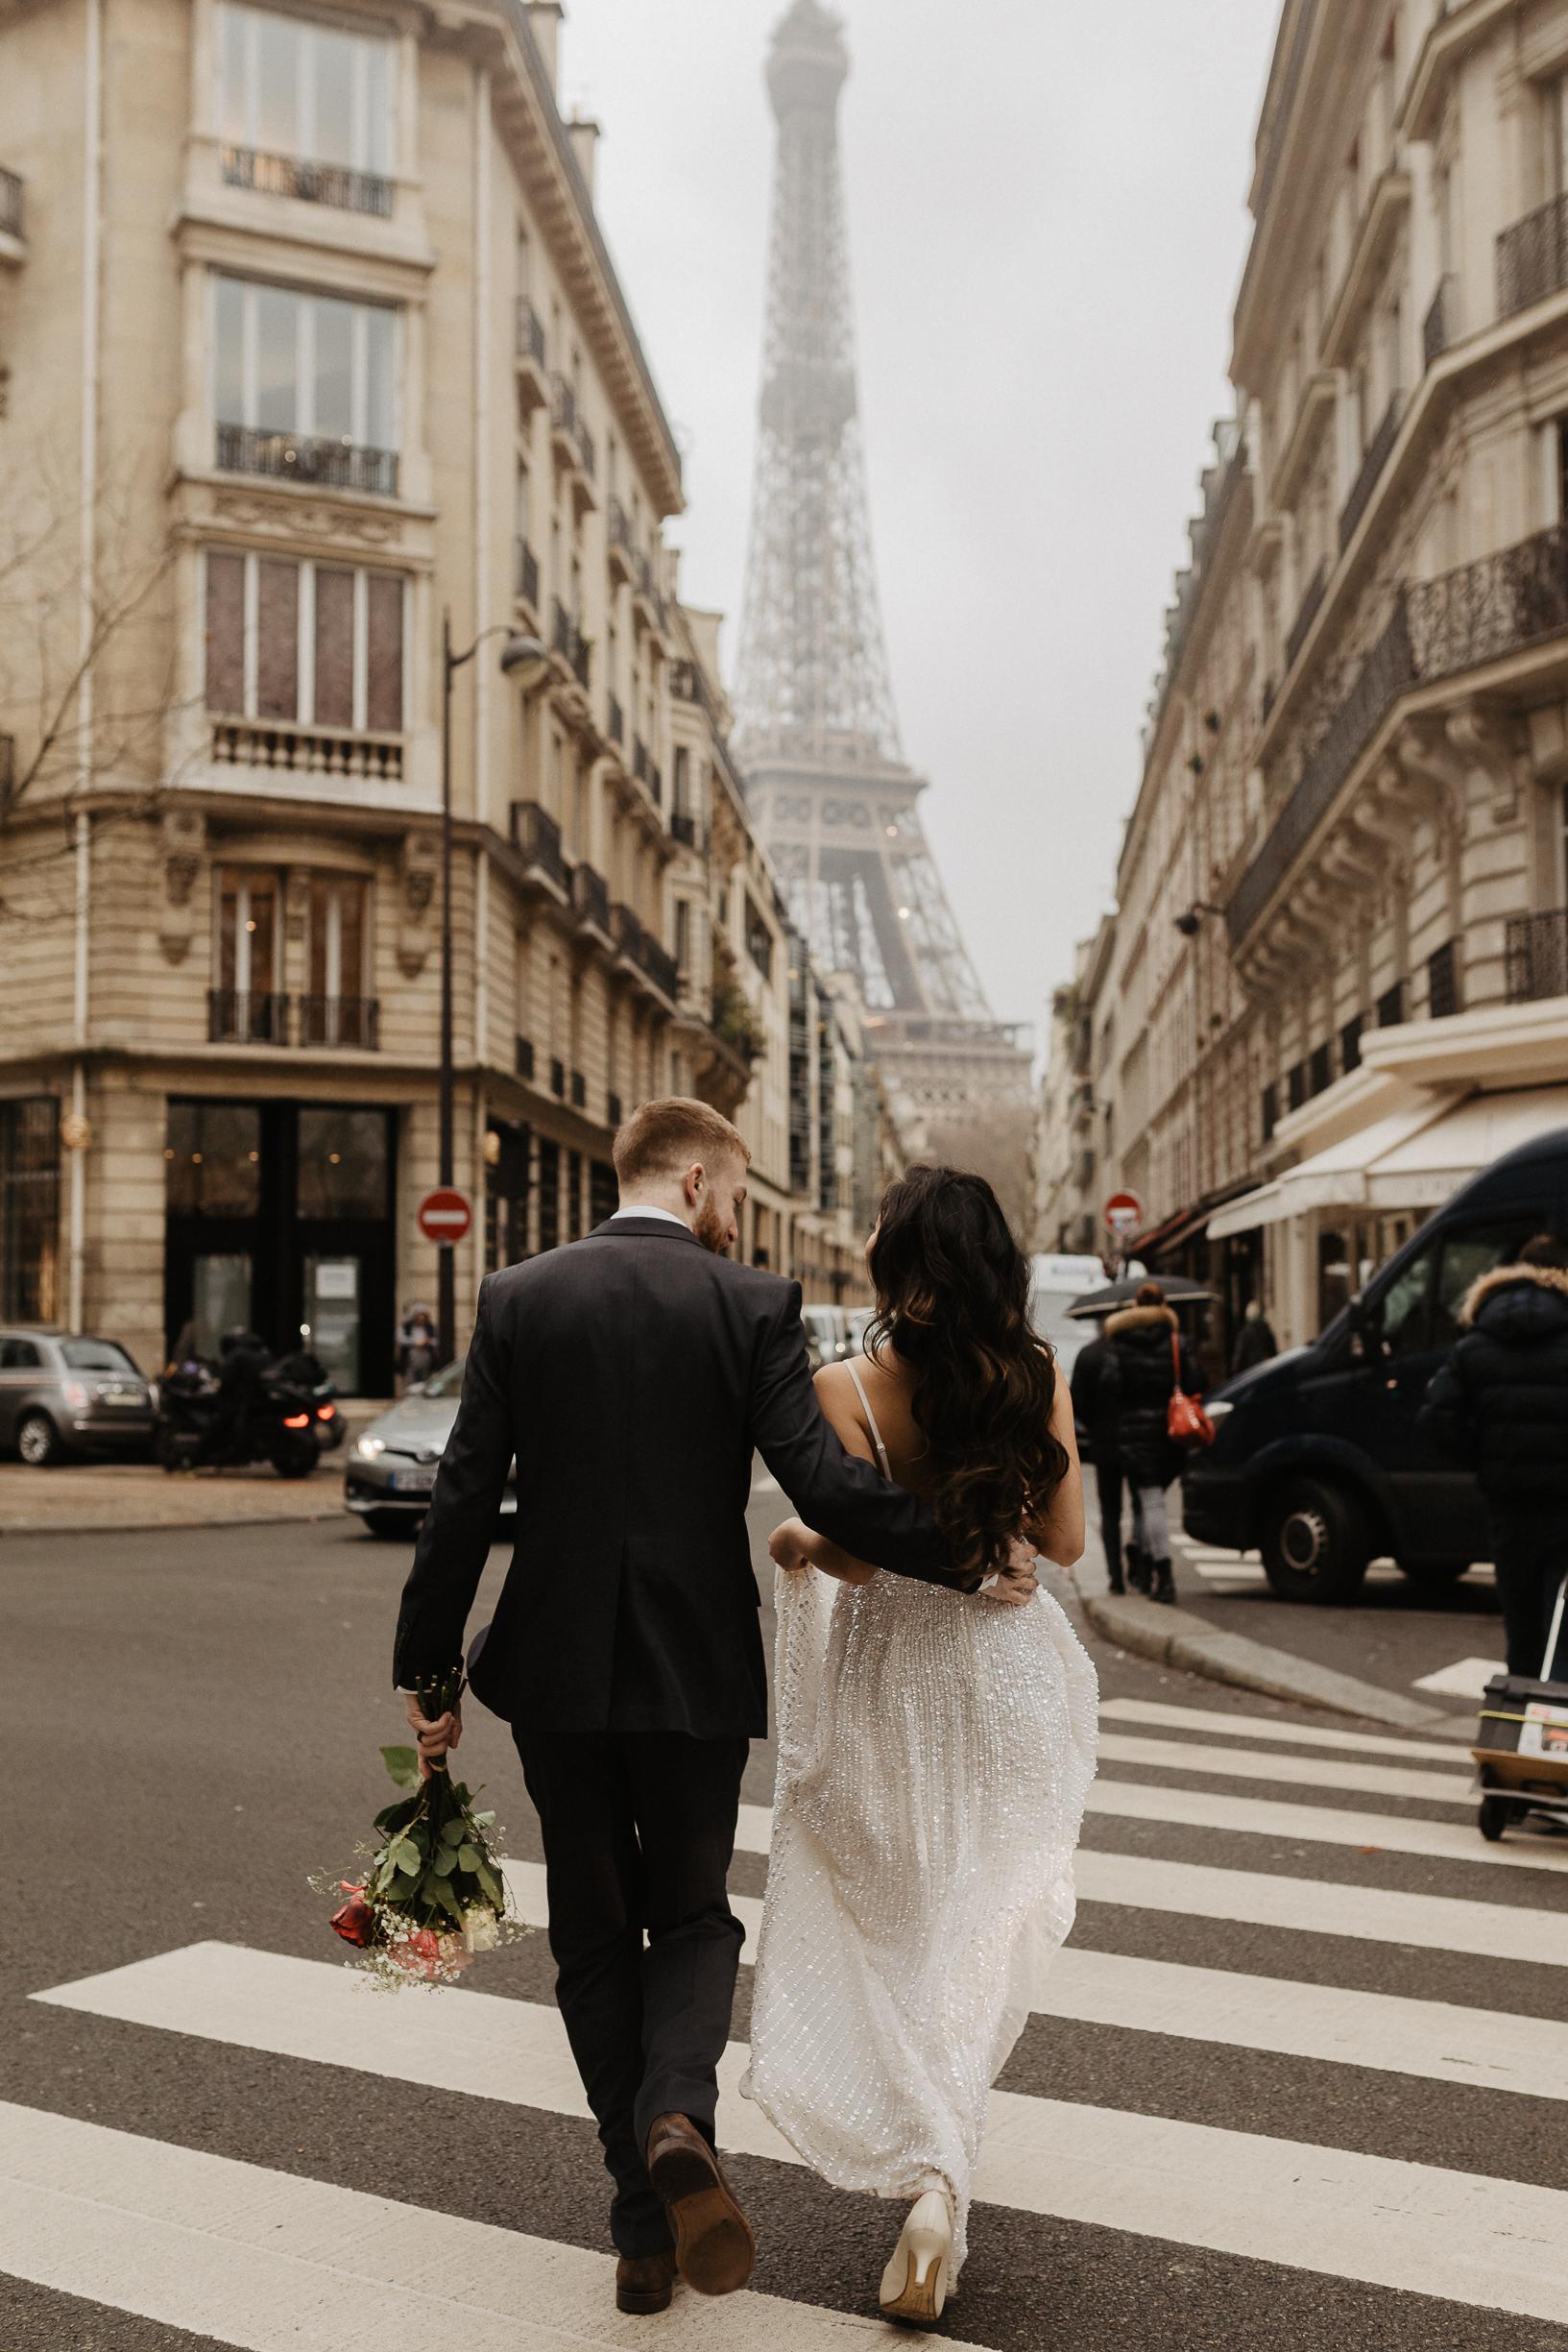 Paris elopement with eiffel tower view